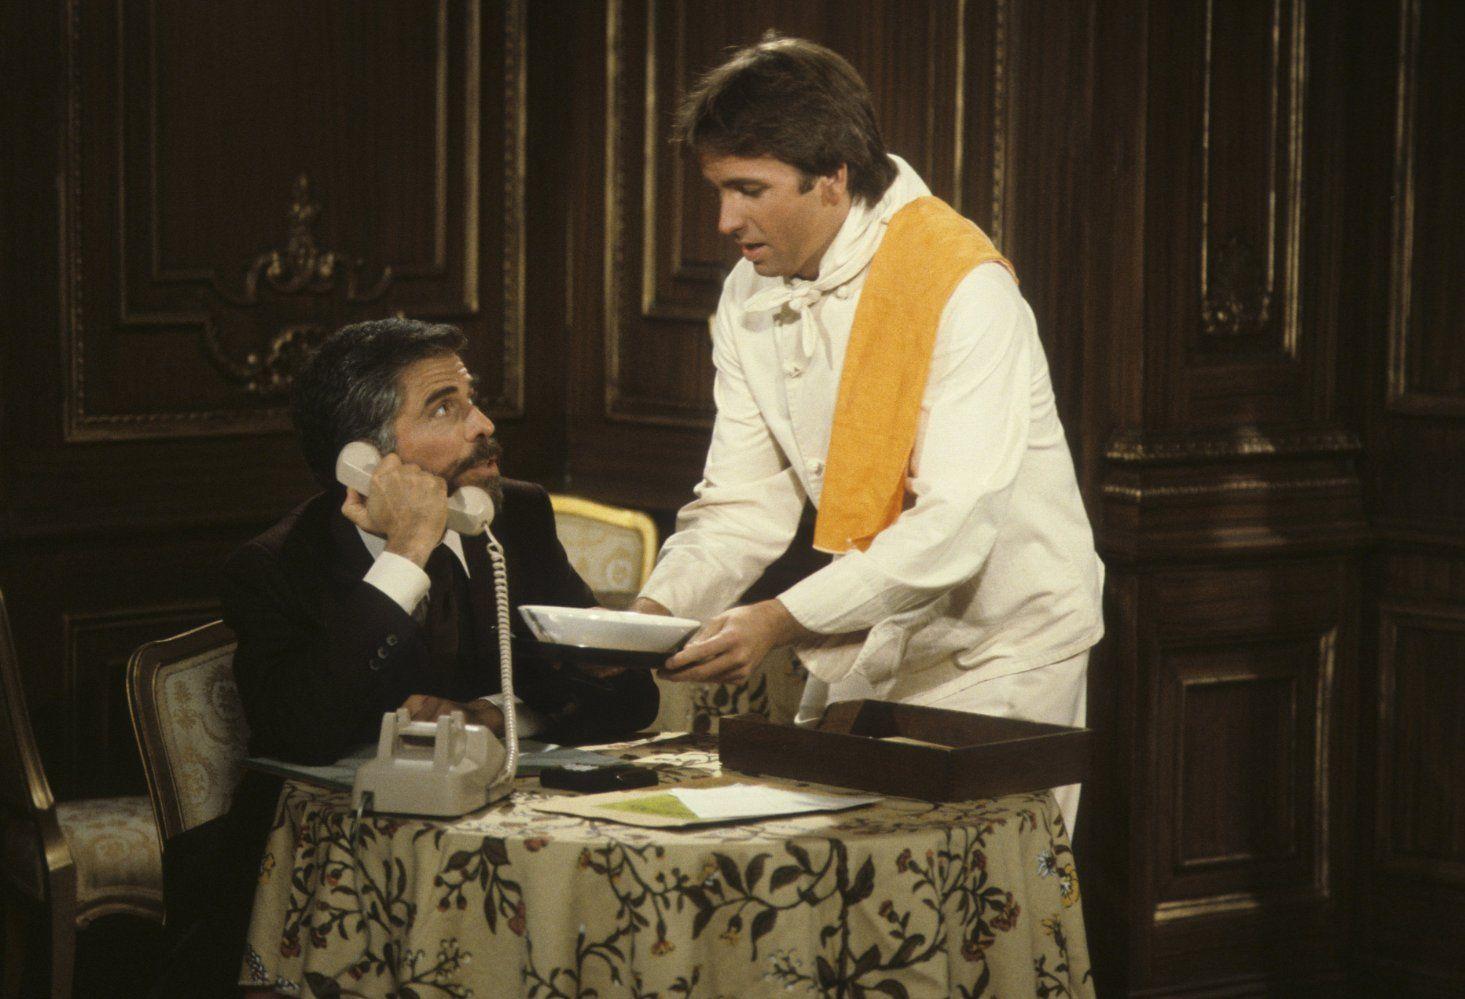 John Ritter and Jordan Charney in Three's Company (1976)